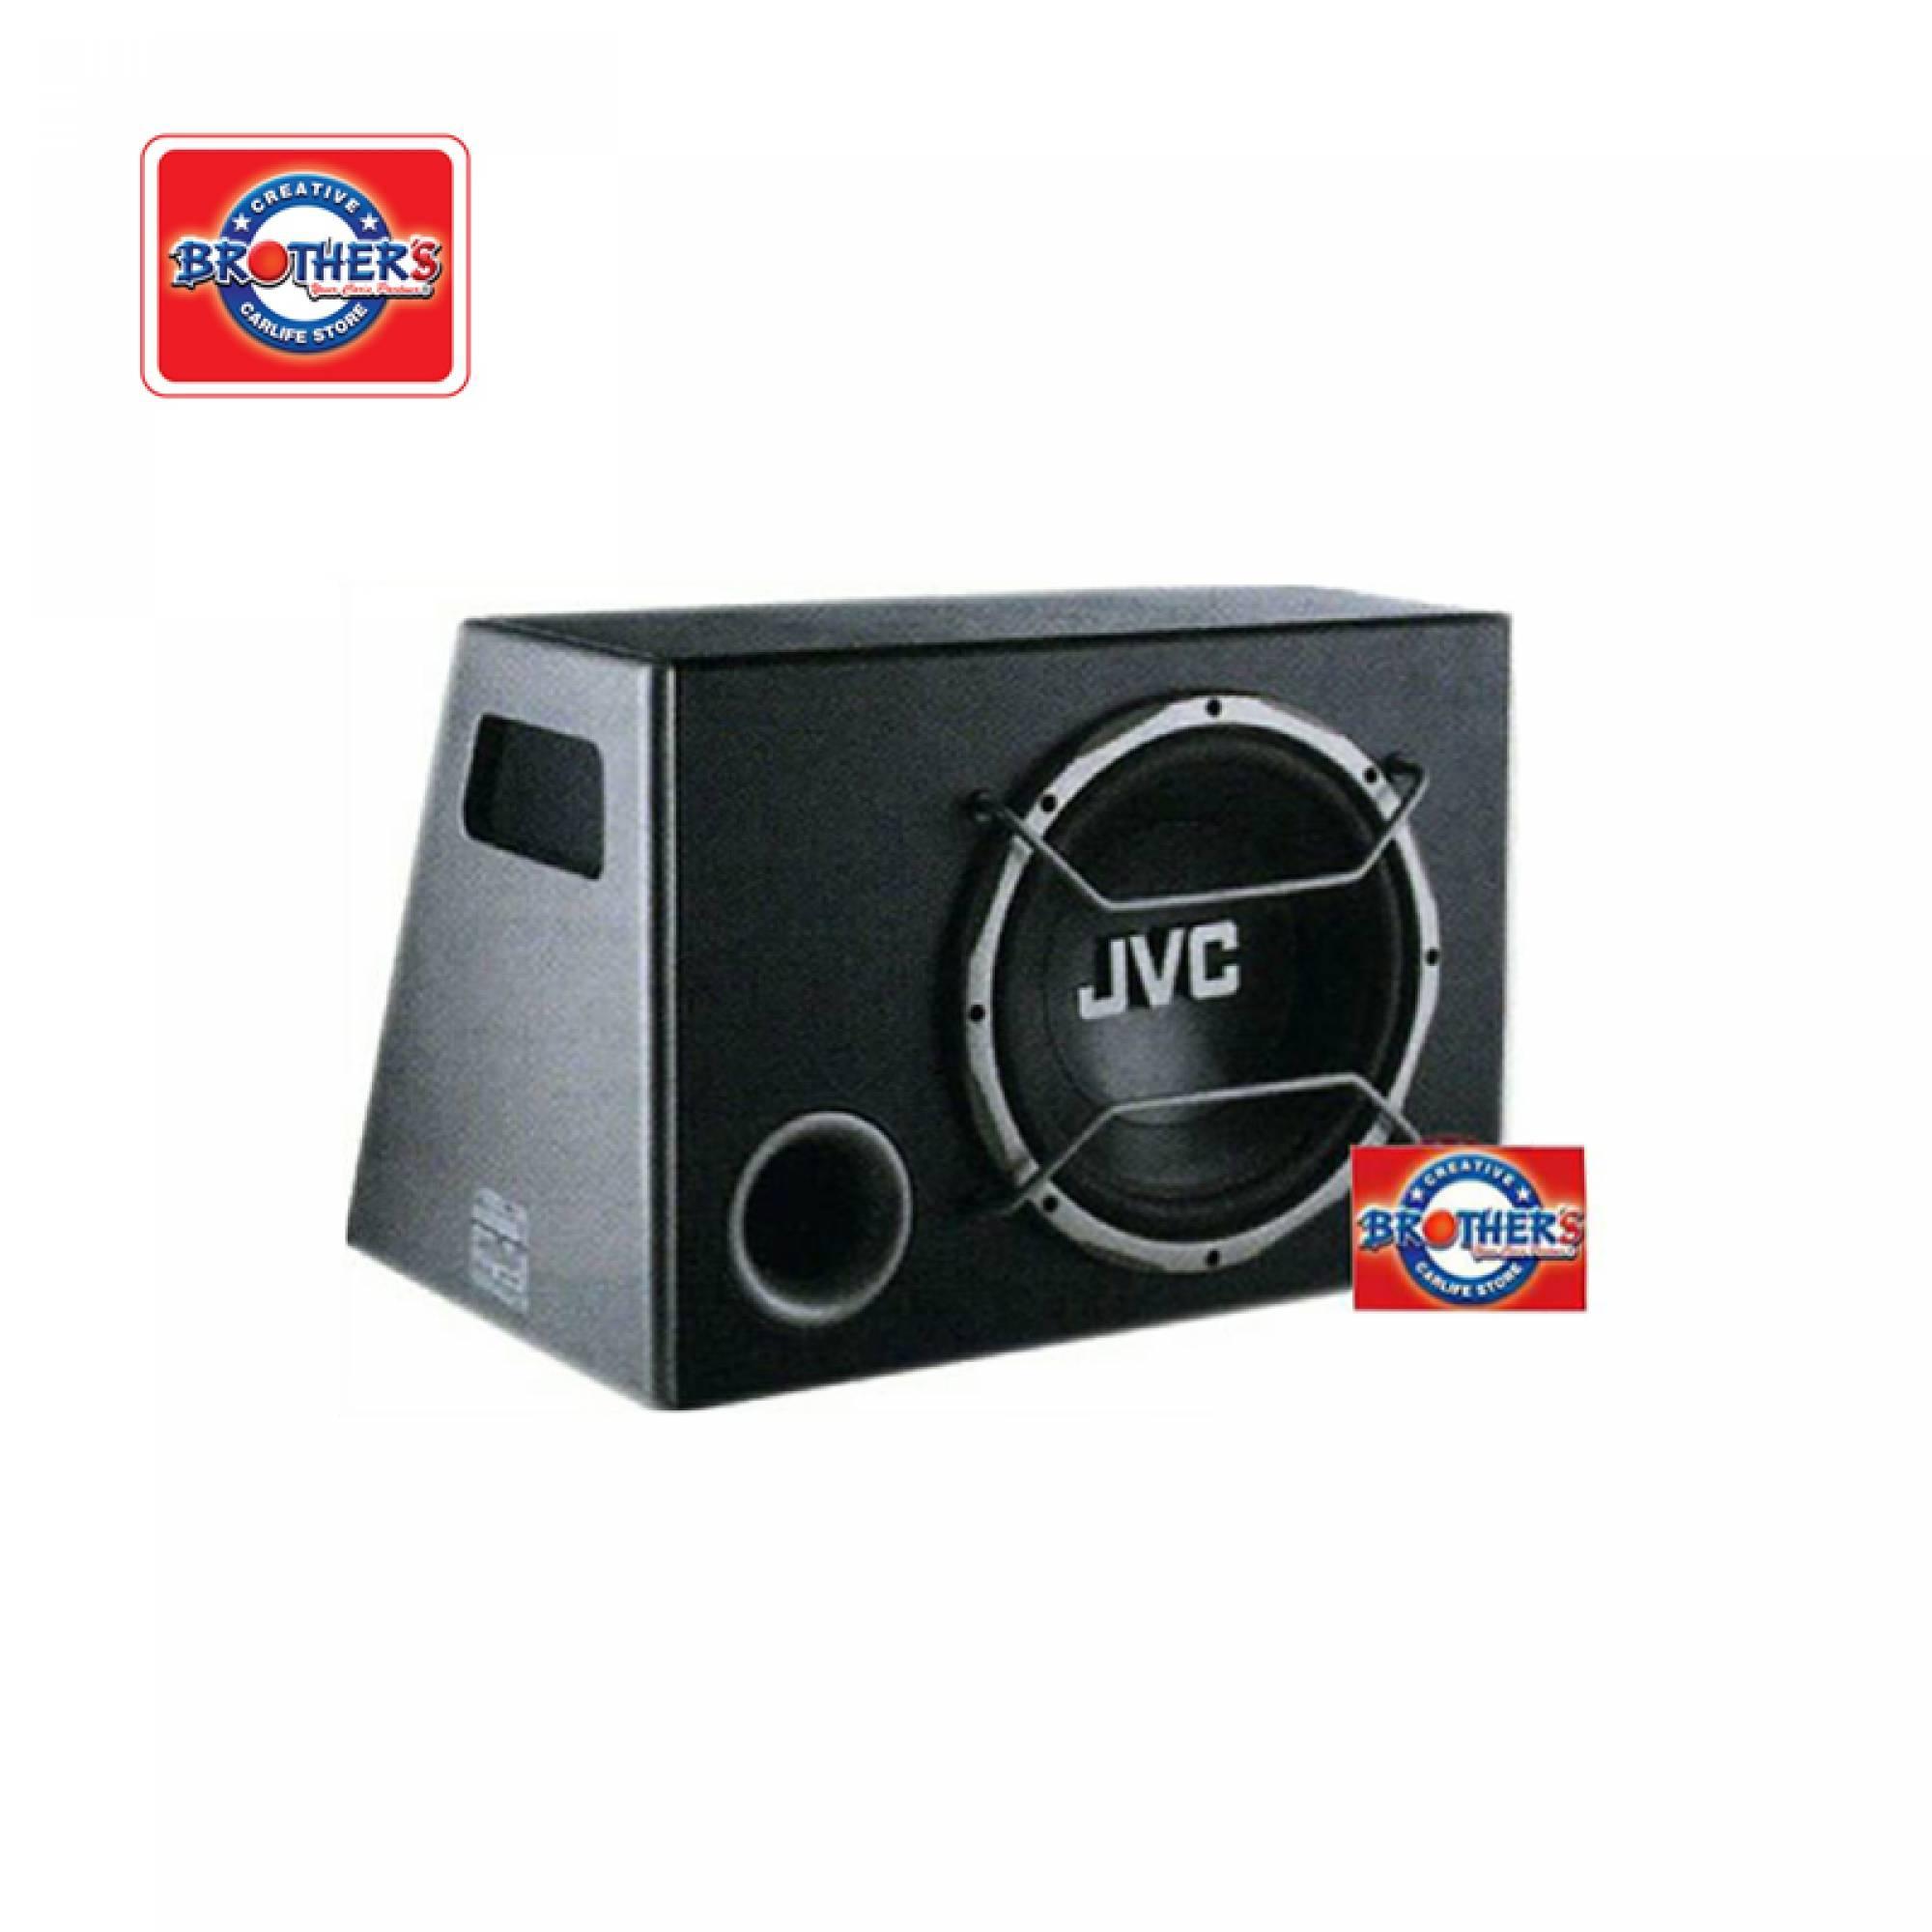 Speaker Woofer Brothers Factory Outlet M Sdn Bhd Online Kit Power Subwoofer Aktif Jvc Cs Bgs5120 12